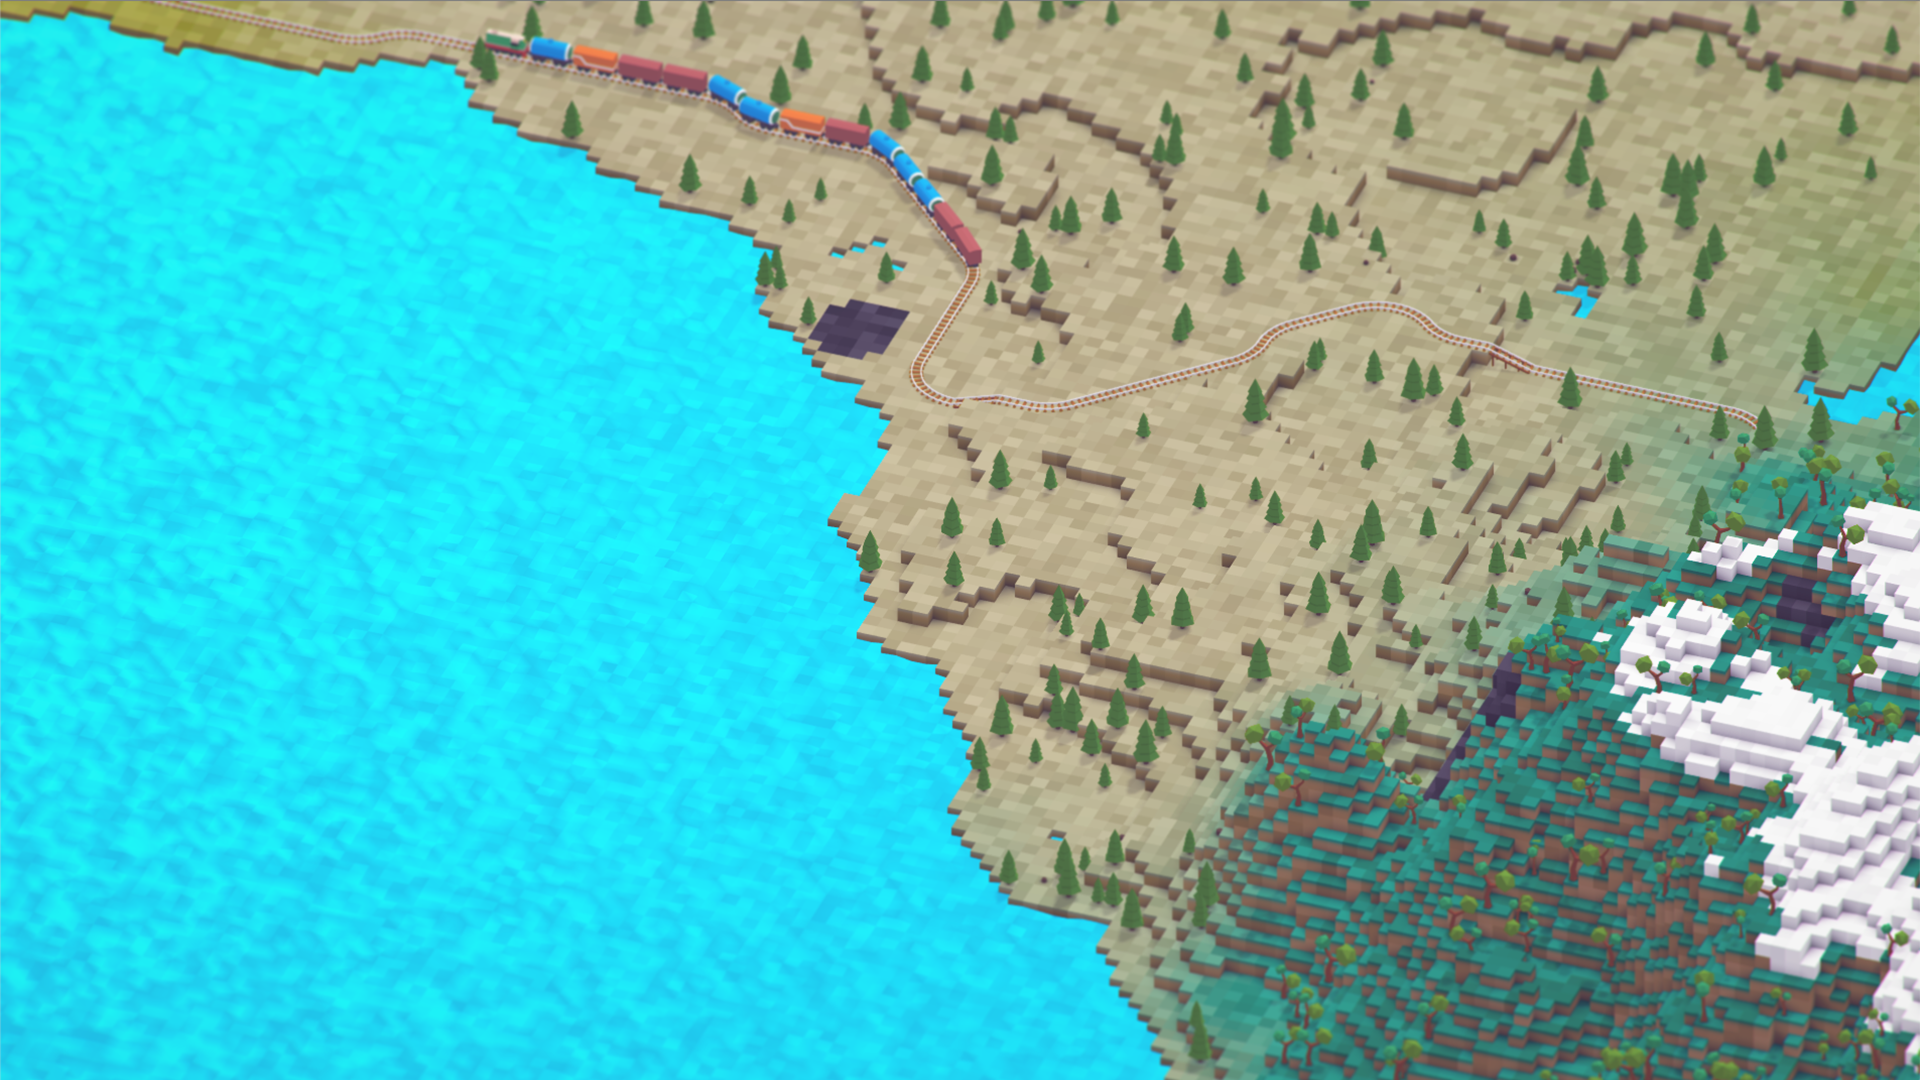 Voxel Tycoon - инди игра от российских разработчиков